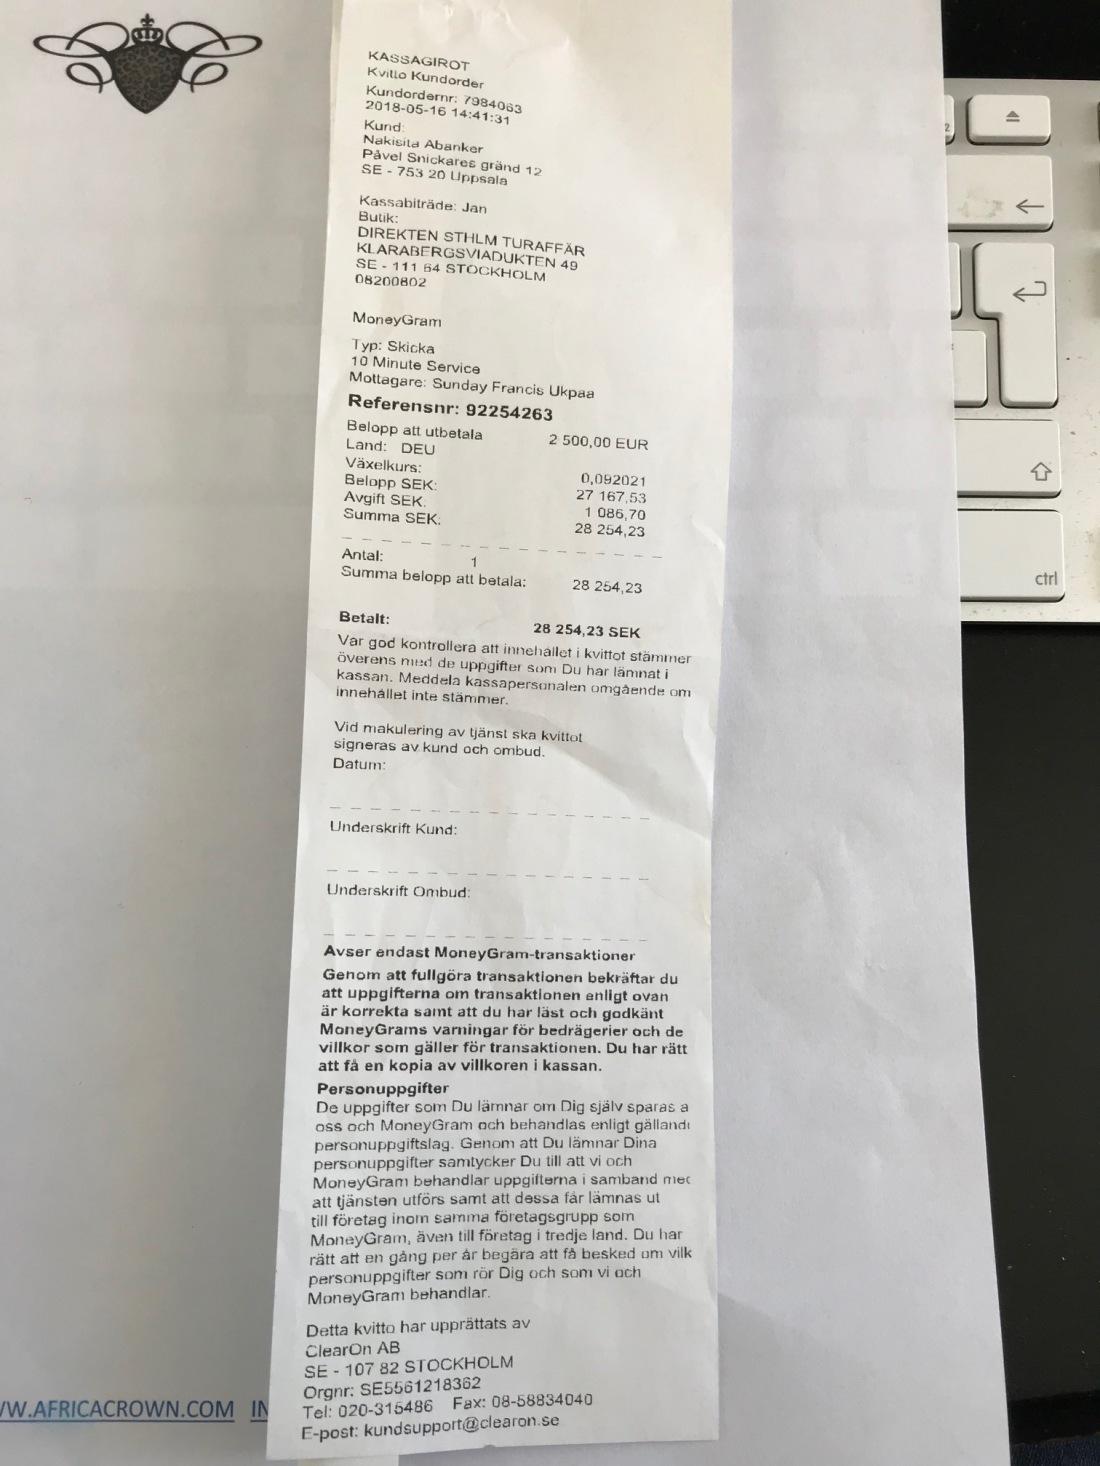 Bet Moneygram 2,500 Euro